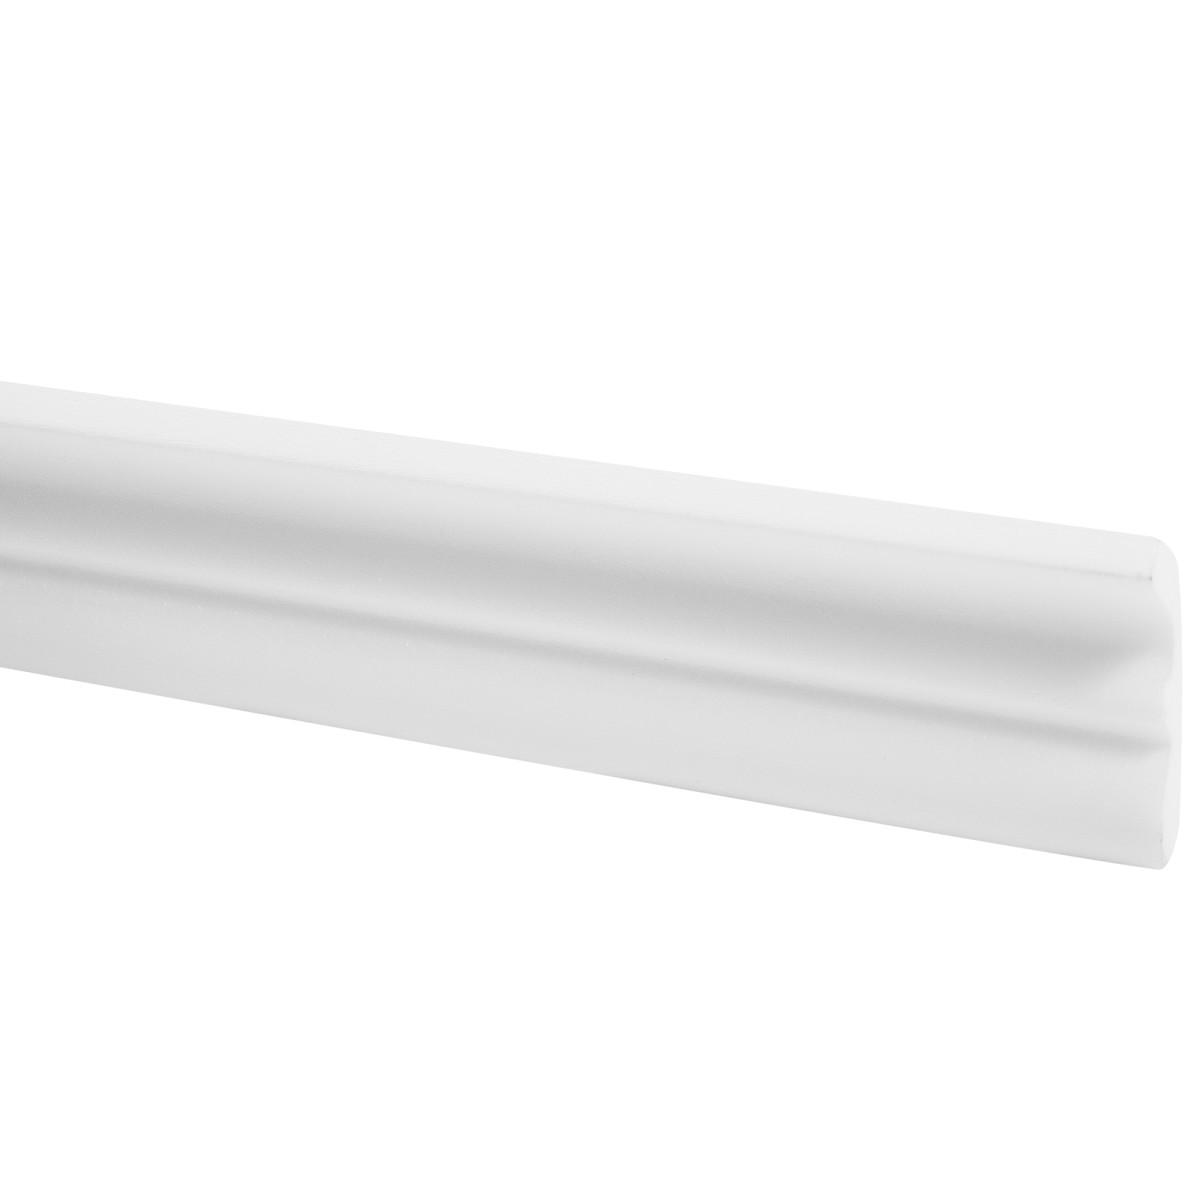 Плинтус потолочный Inspire С03/35 3.2х3.2х200 см цвет белый